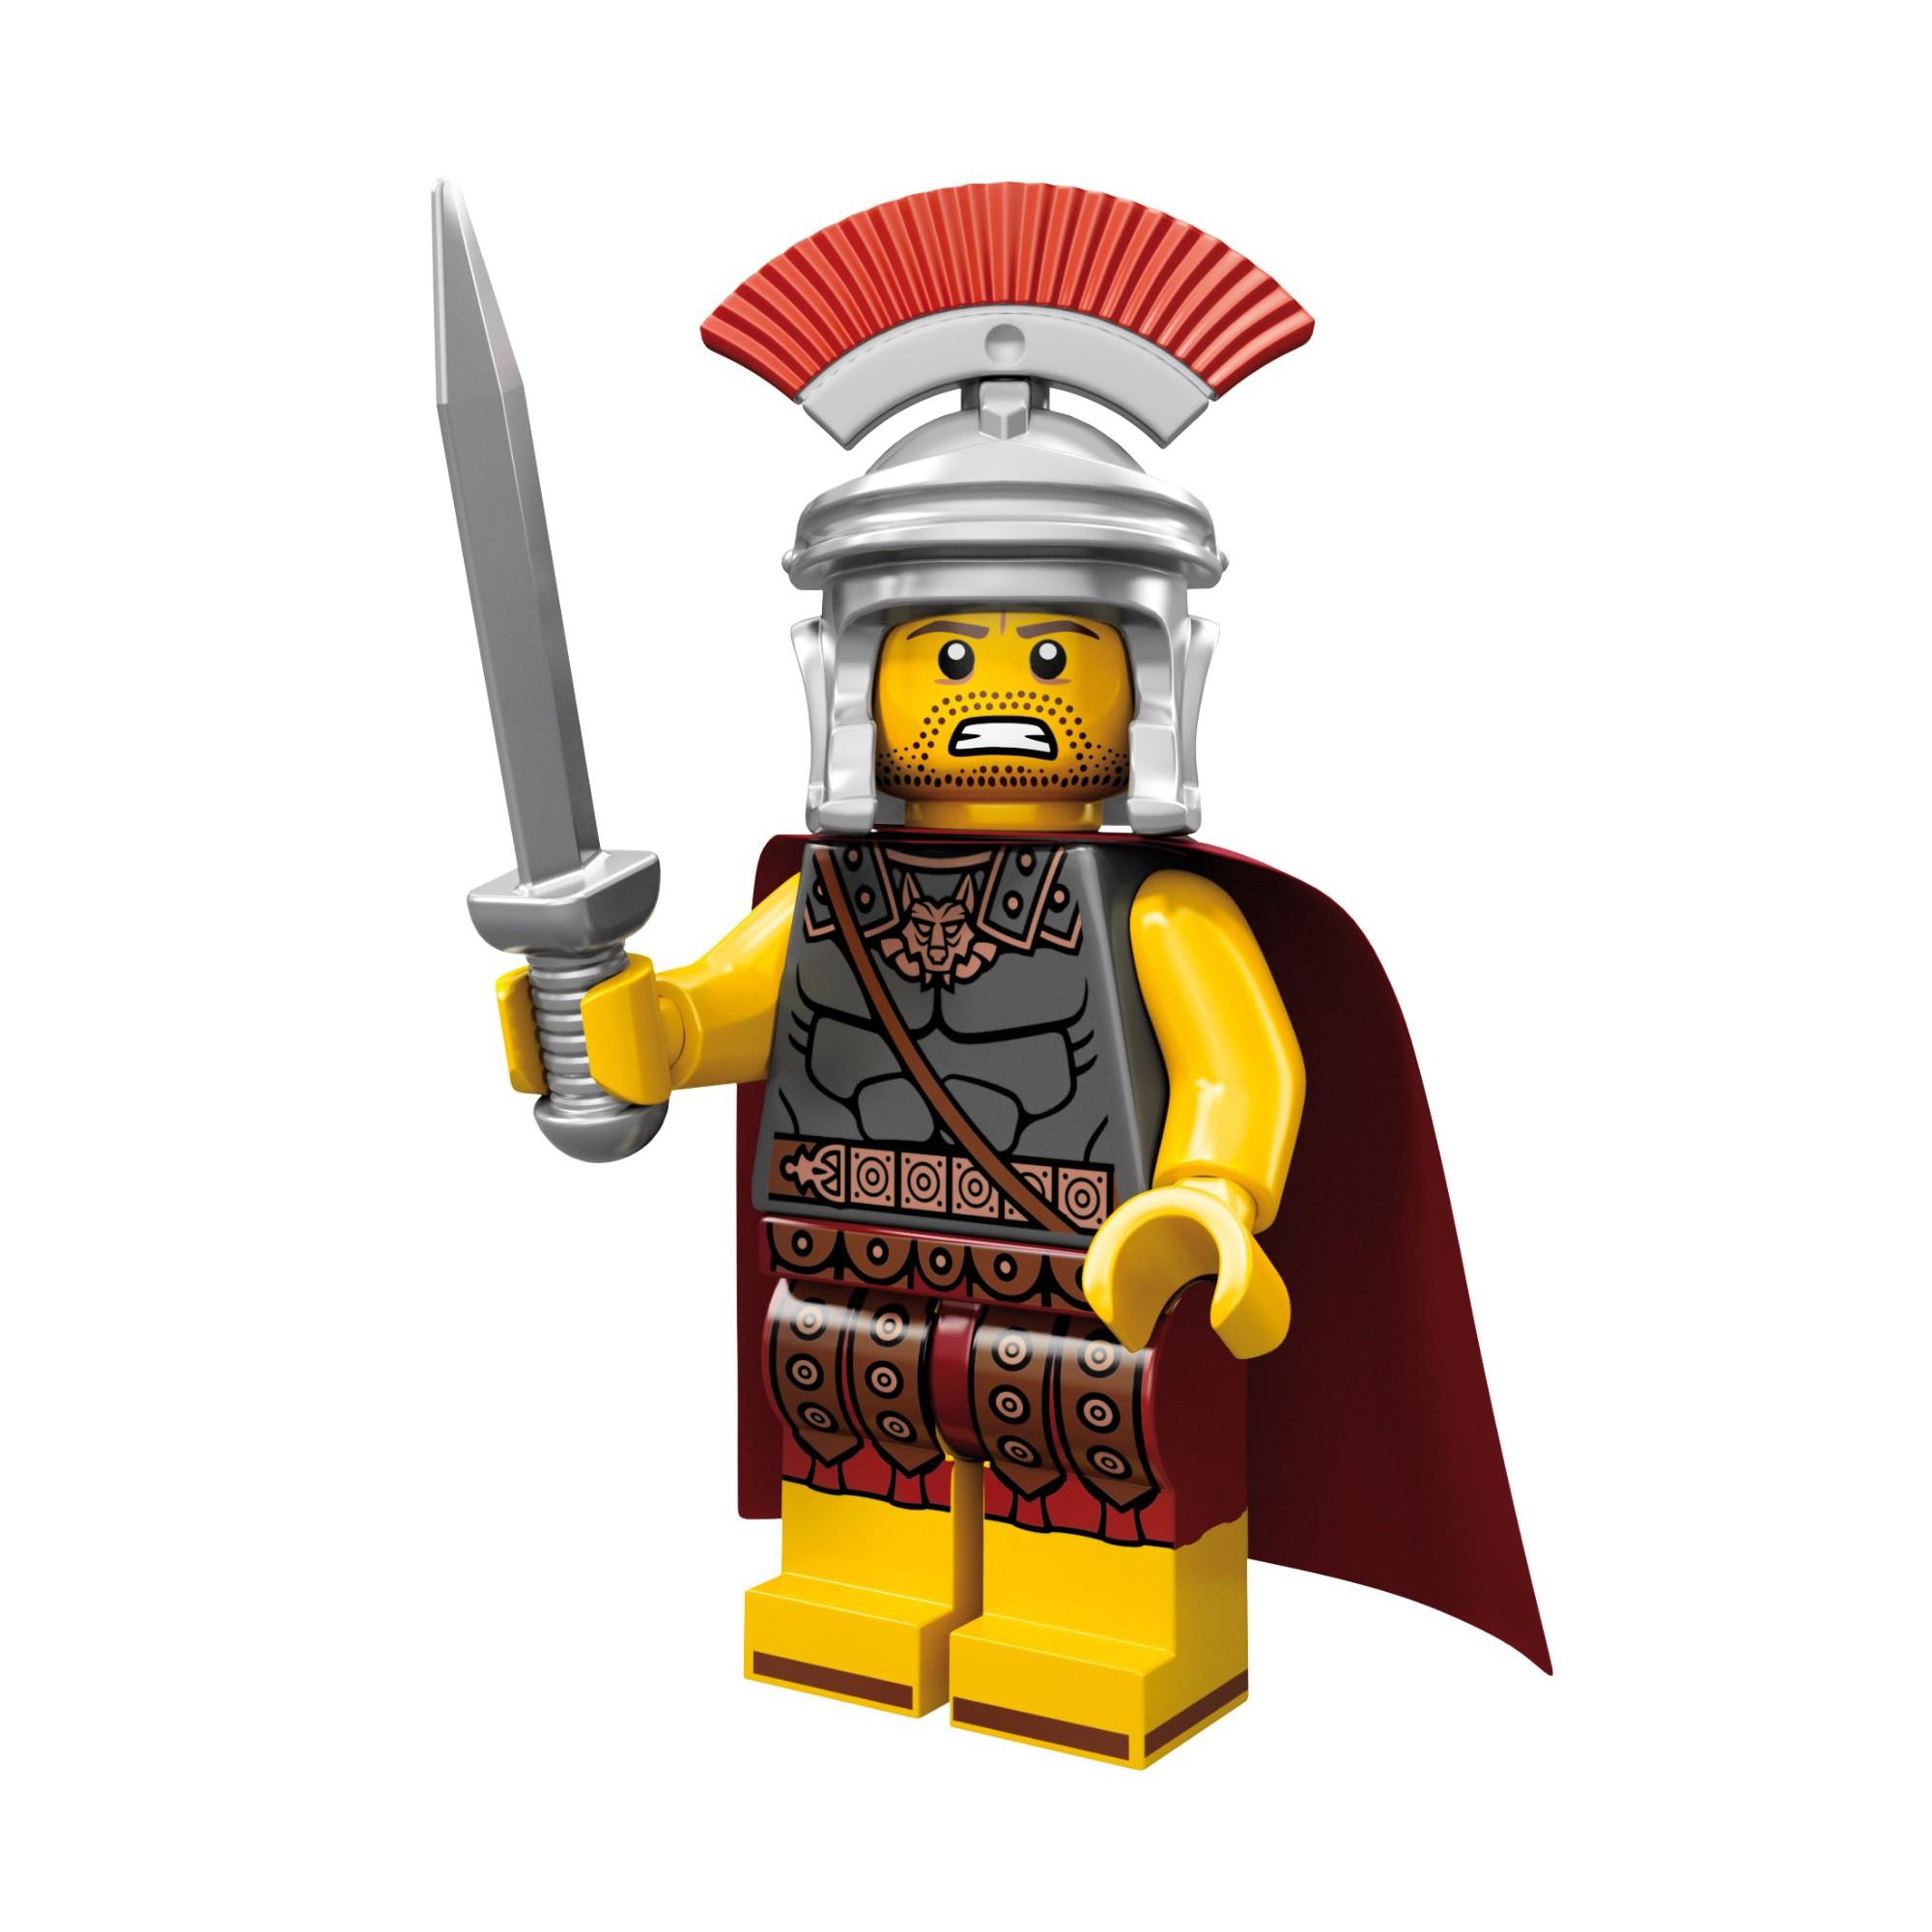 ROMAN COMMANDER New LEGO Collectible Minifigure Series 10